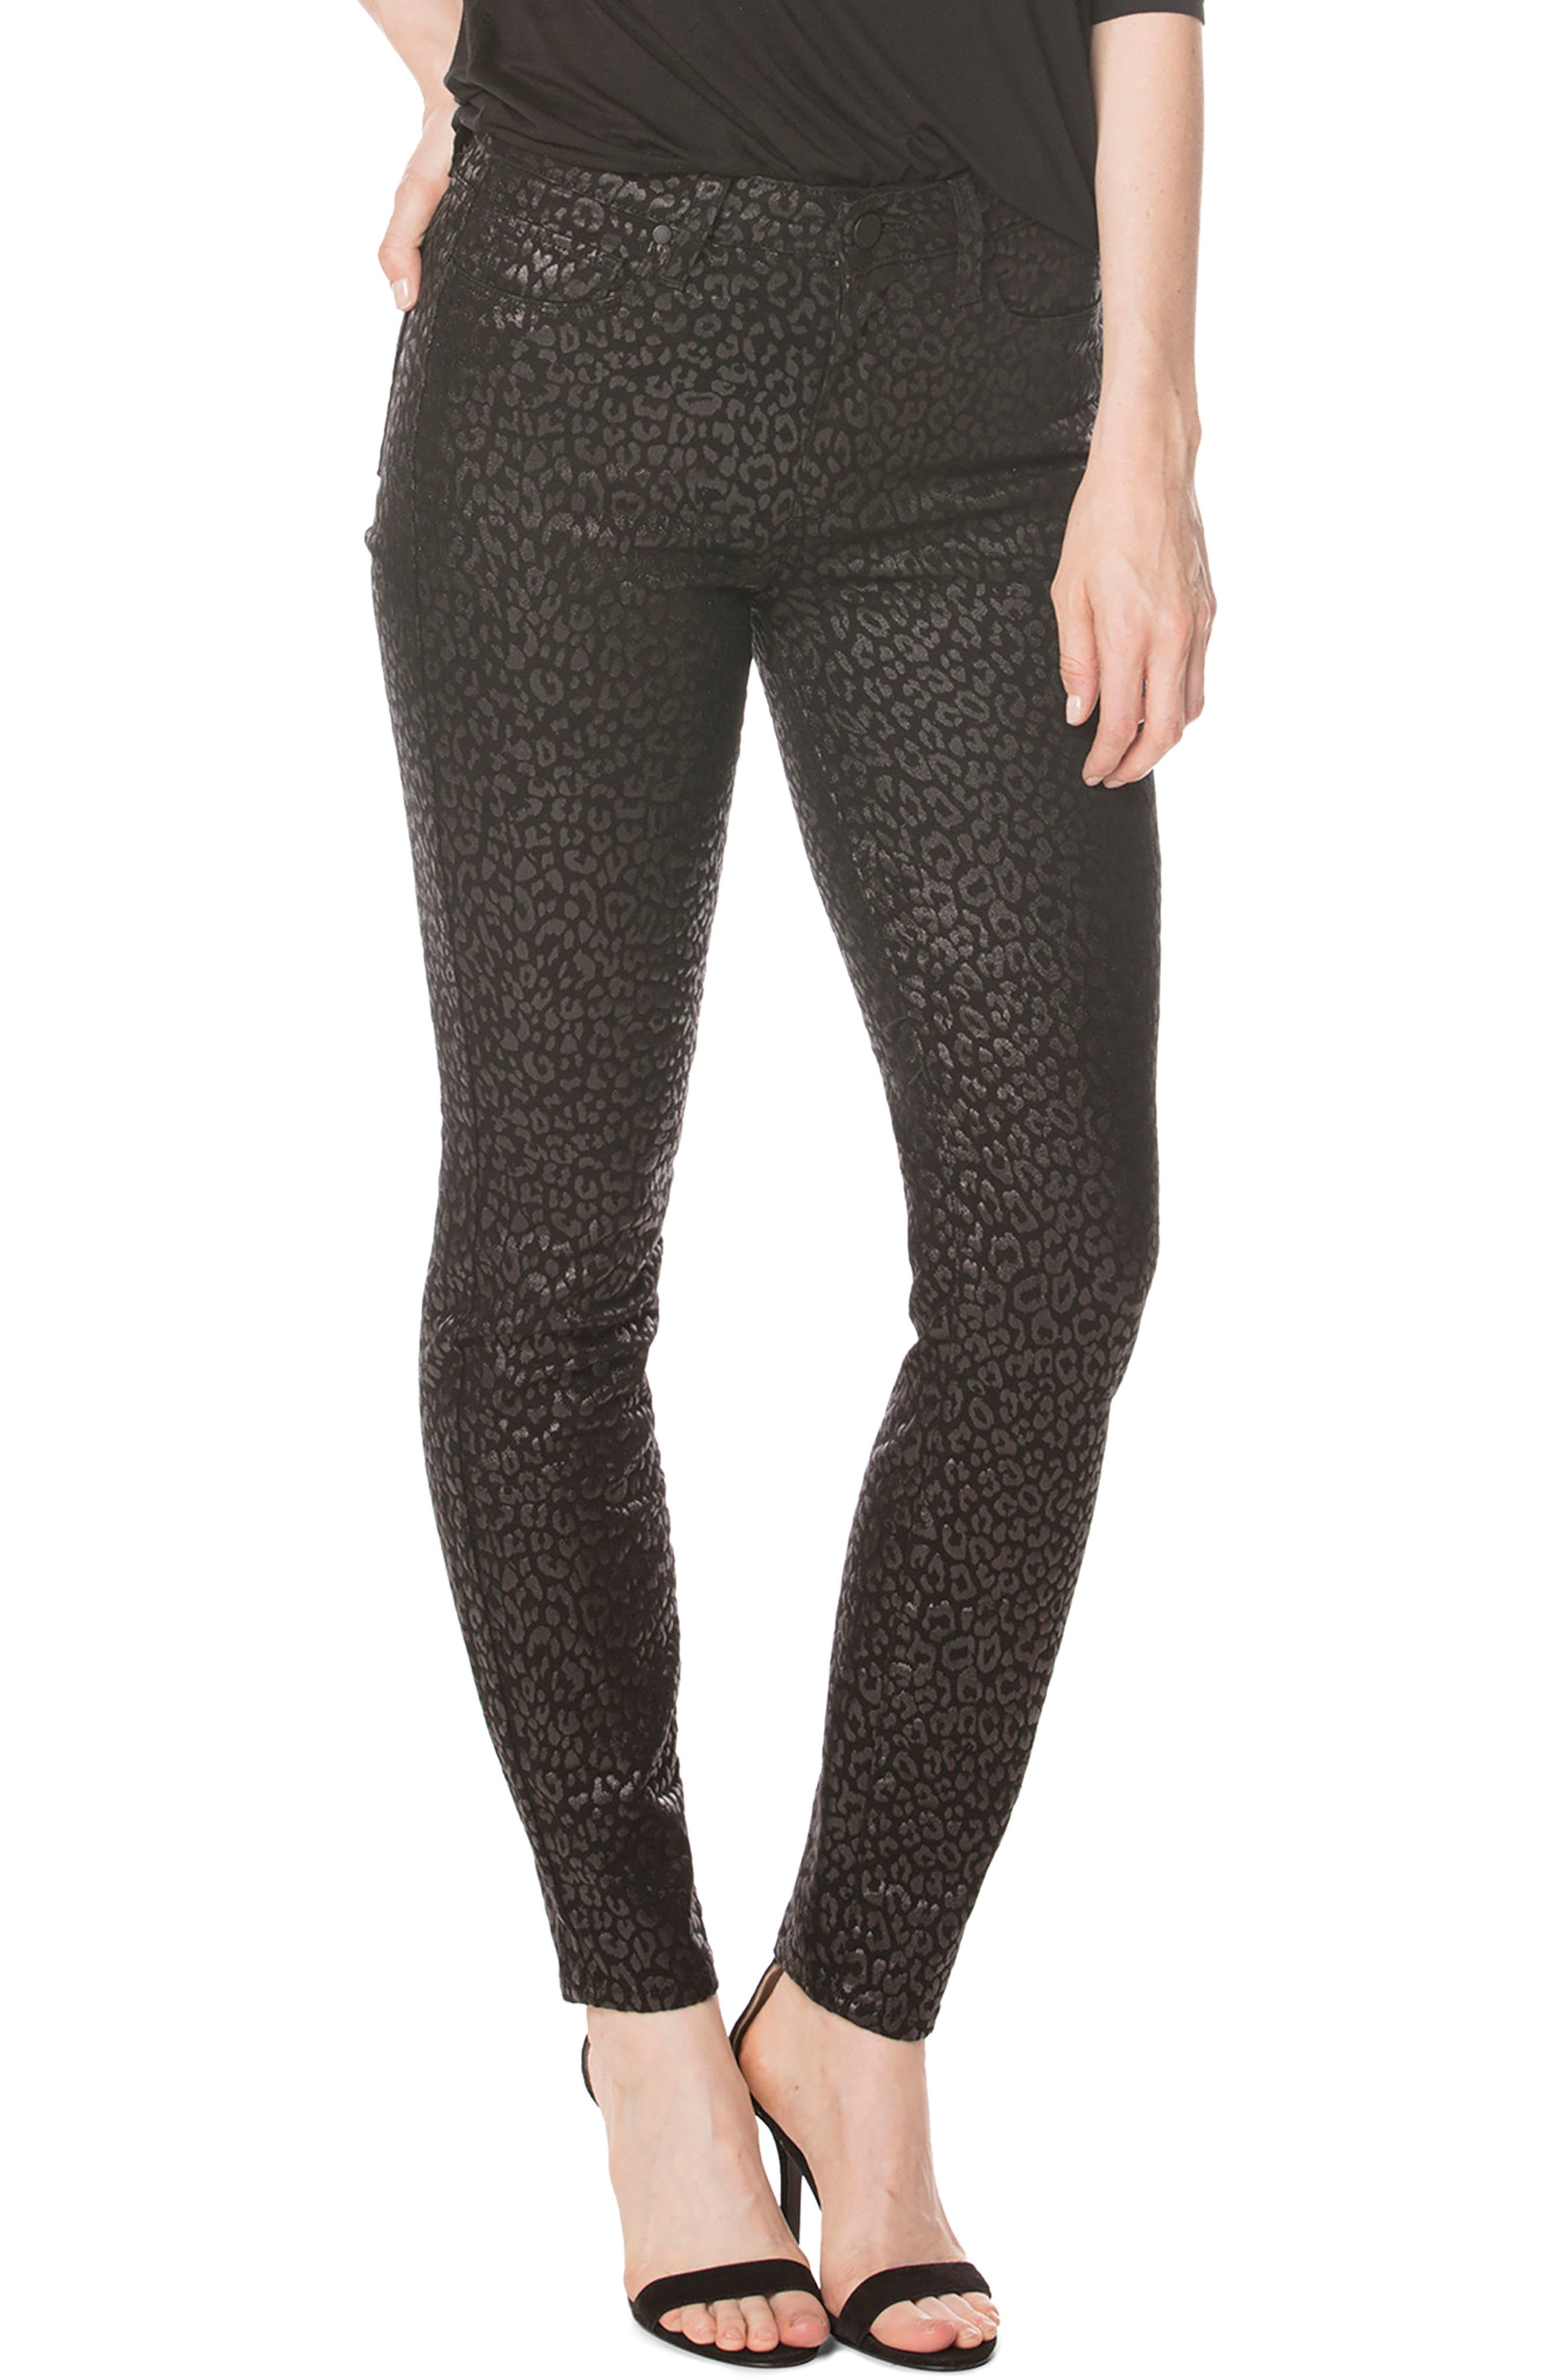 Hoxton High Waist Ultra Skinny Pants,                             Main thumbnail 1, color,                             001